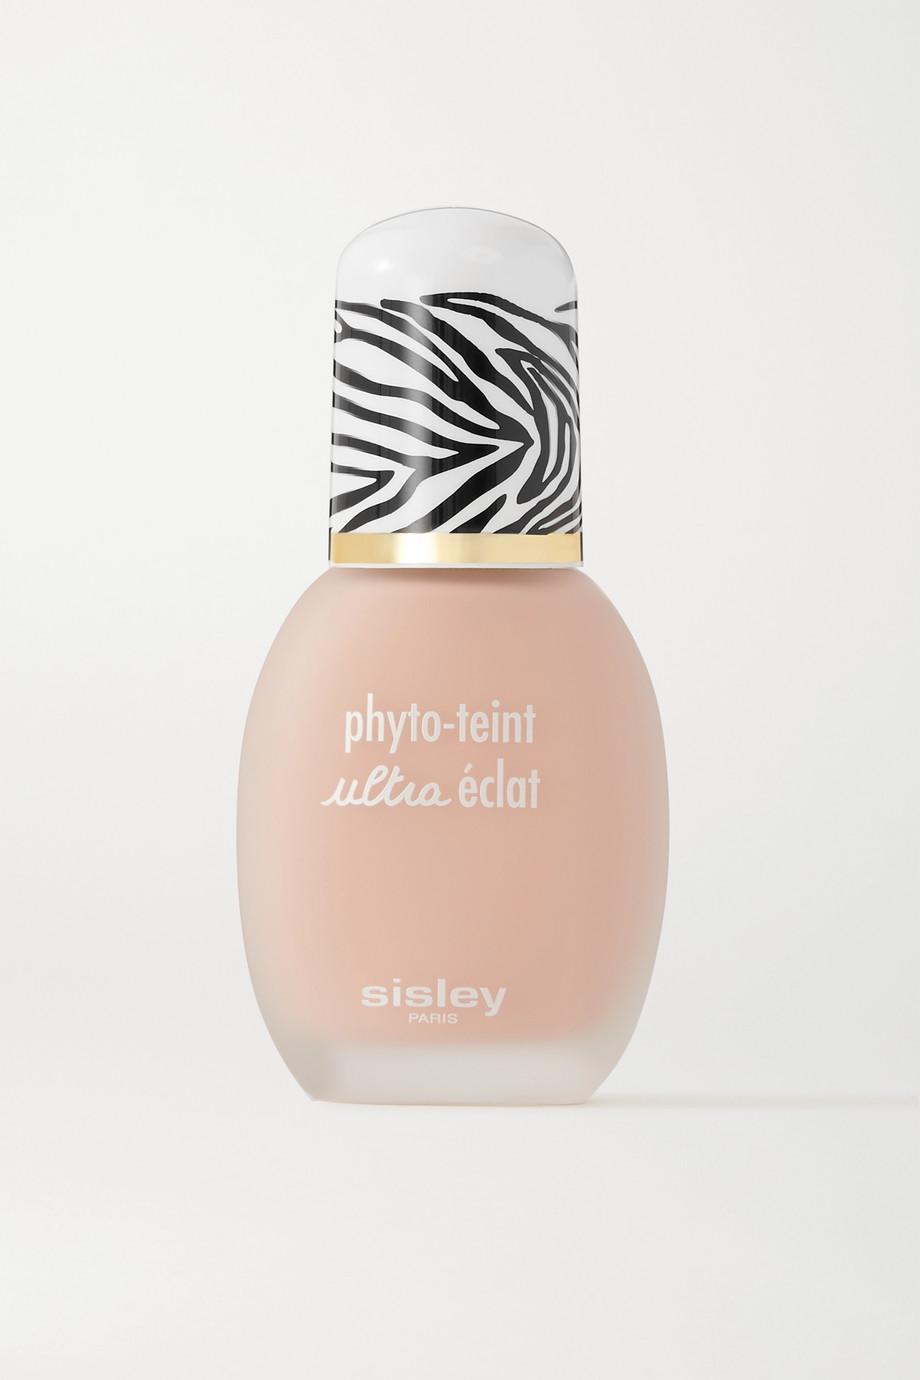 Sisley Phyto-Teint Ultra Éclat Radiance Boosting Foundation - 00 Swan, 30ml